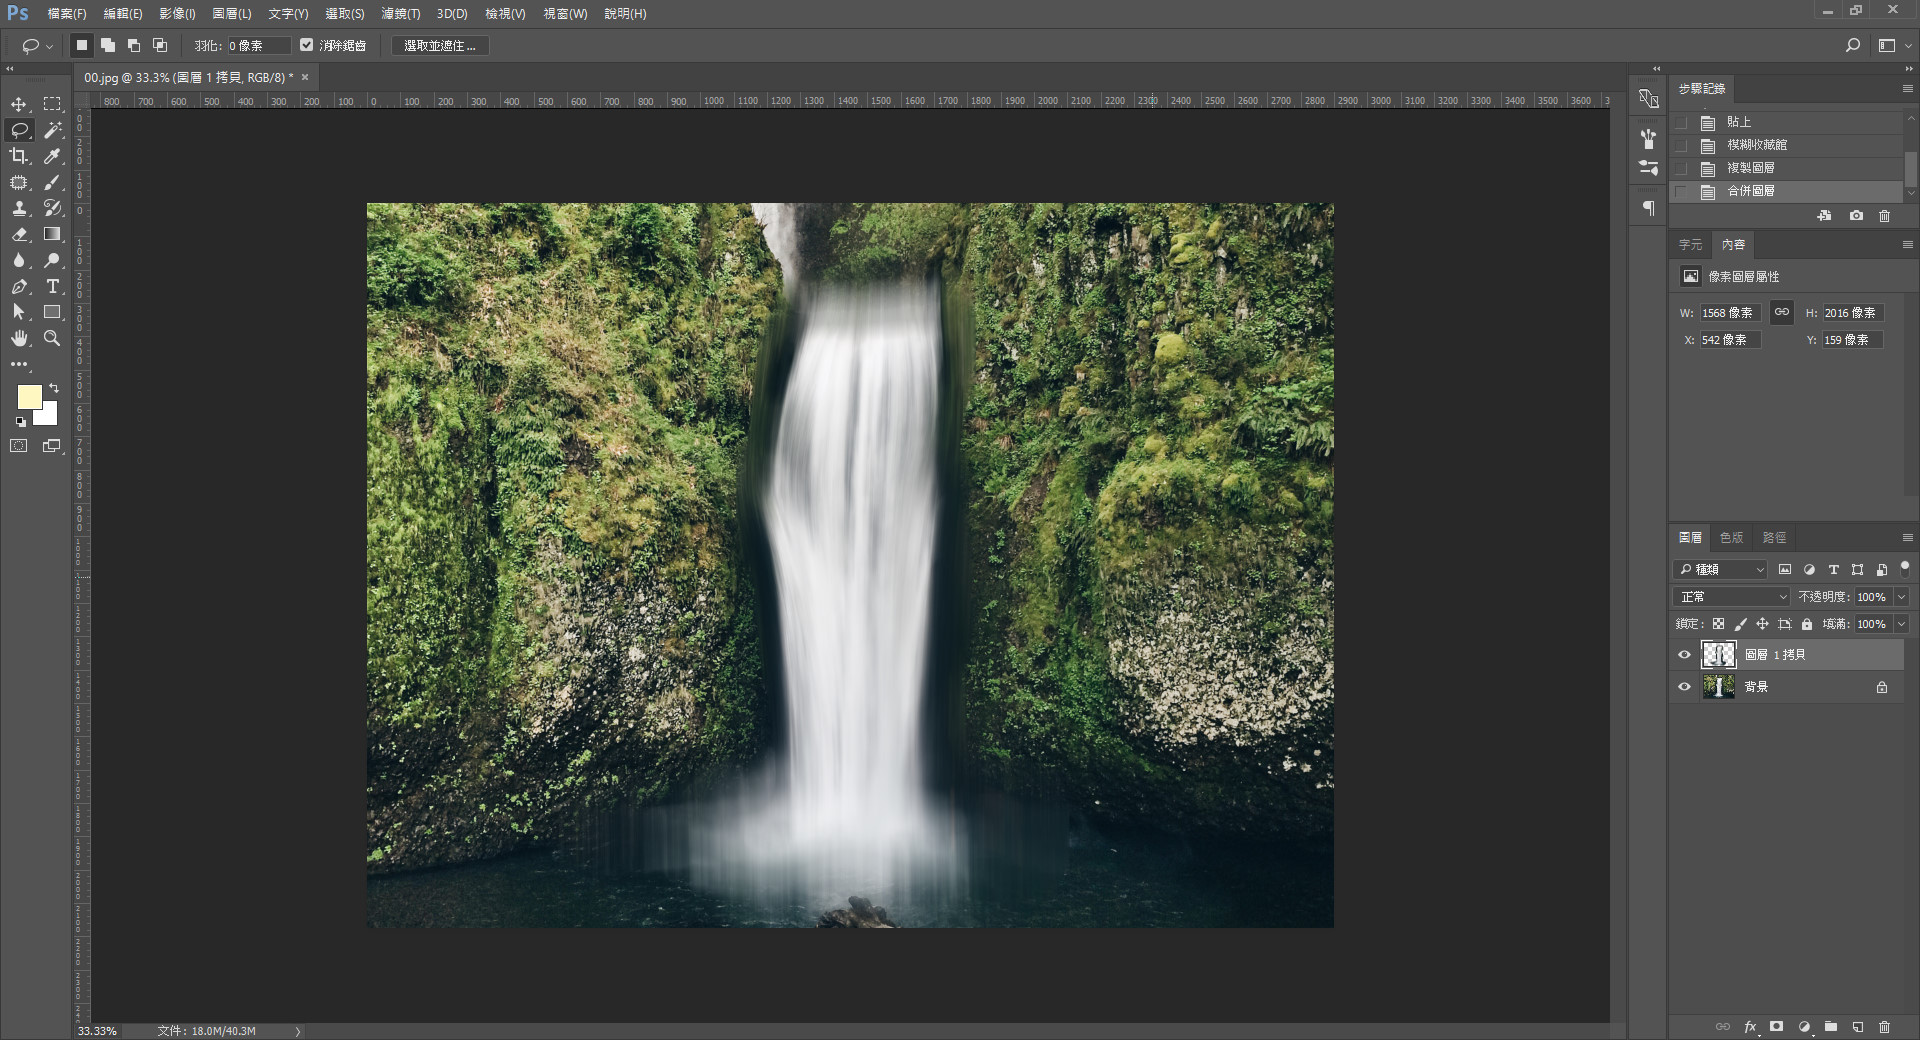 Photoshop - Path Blur Tool (12)